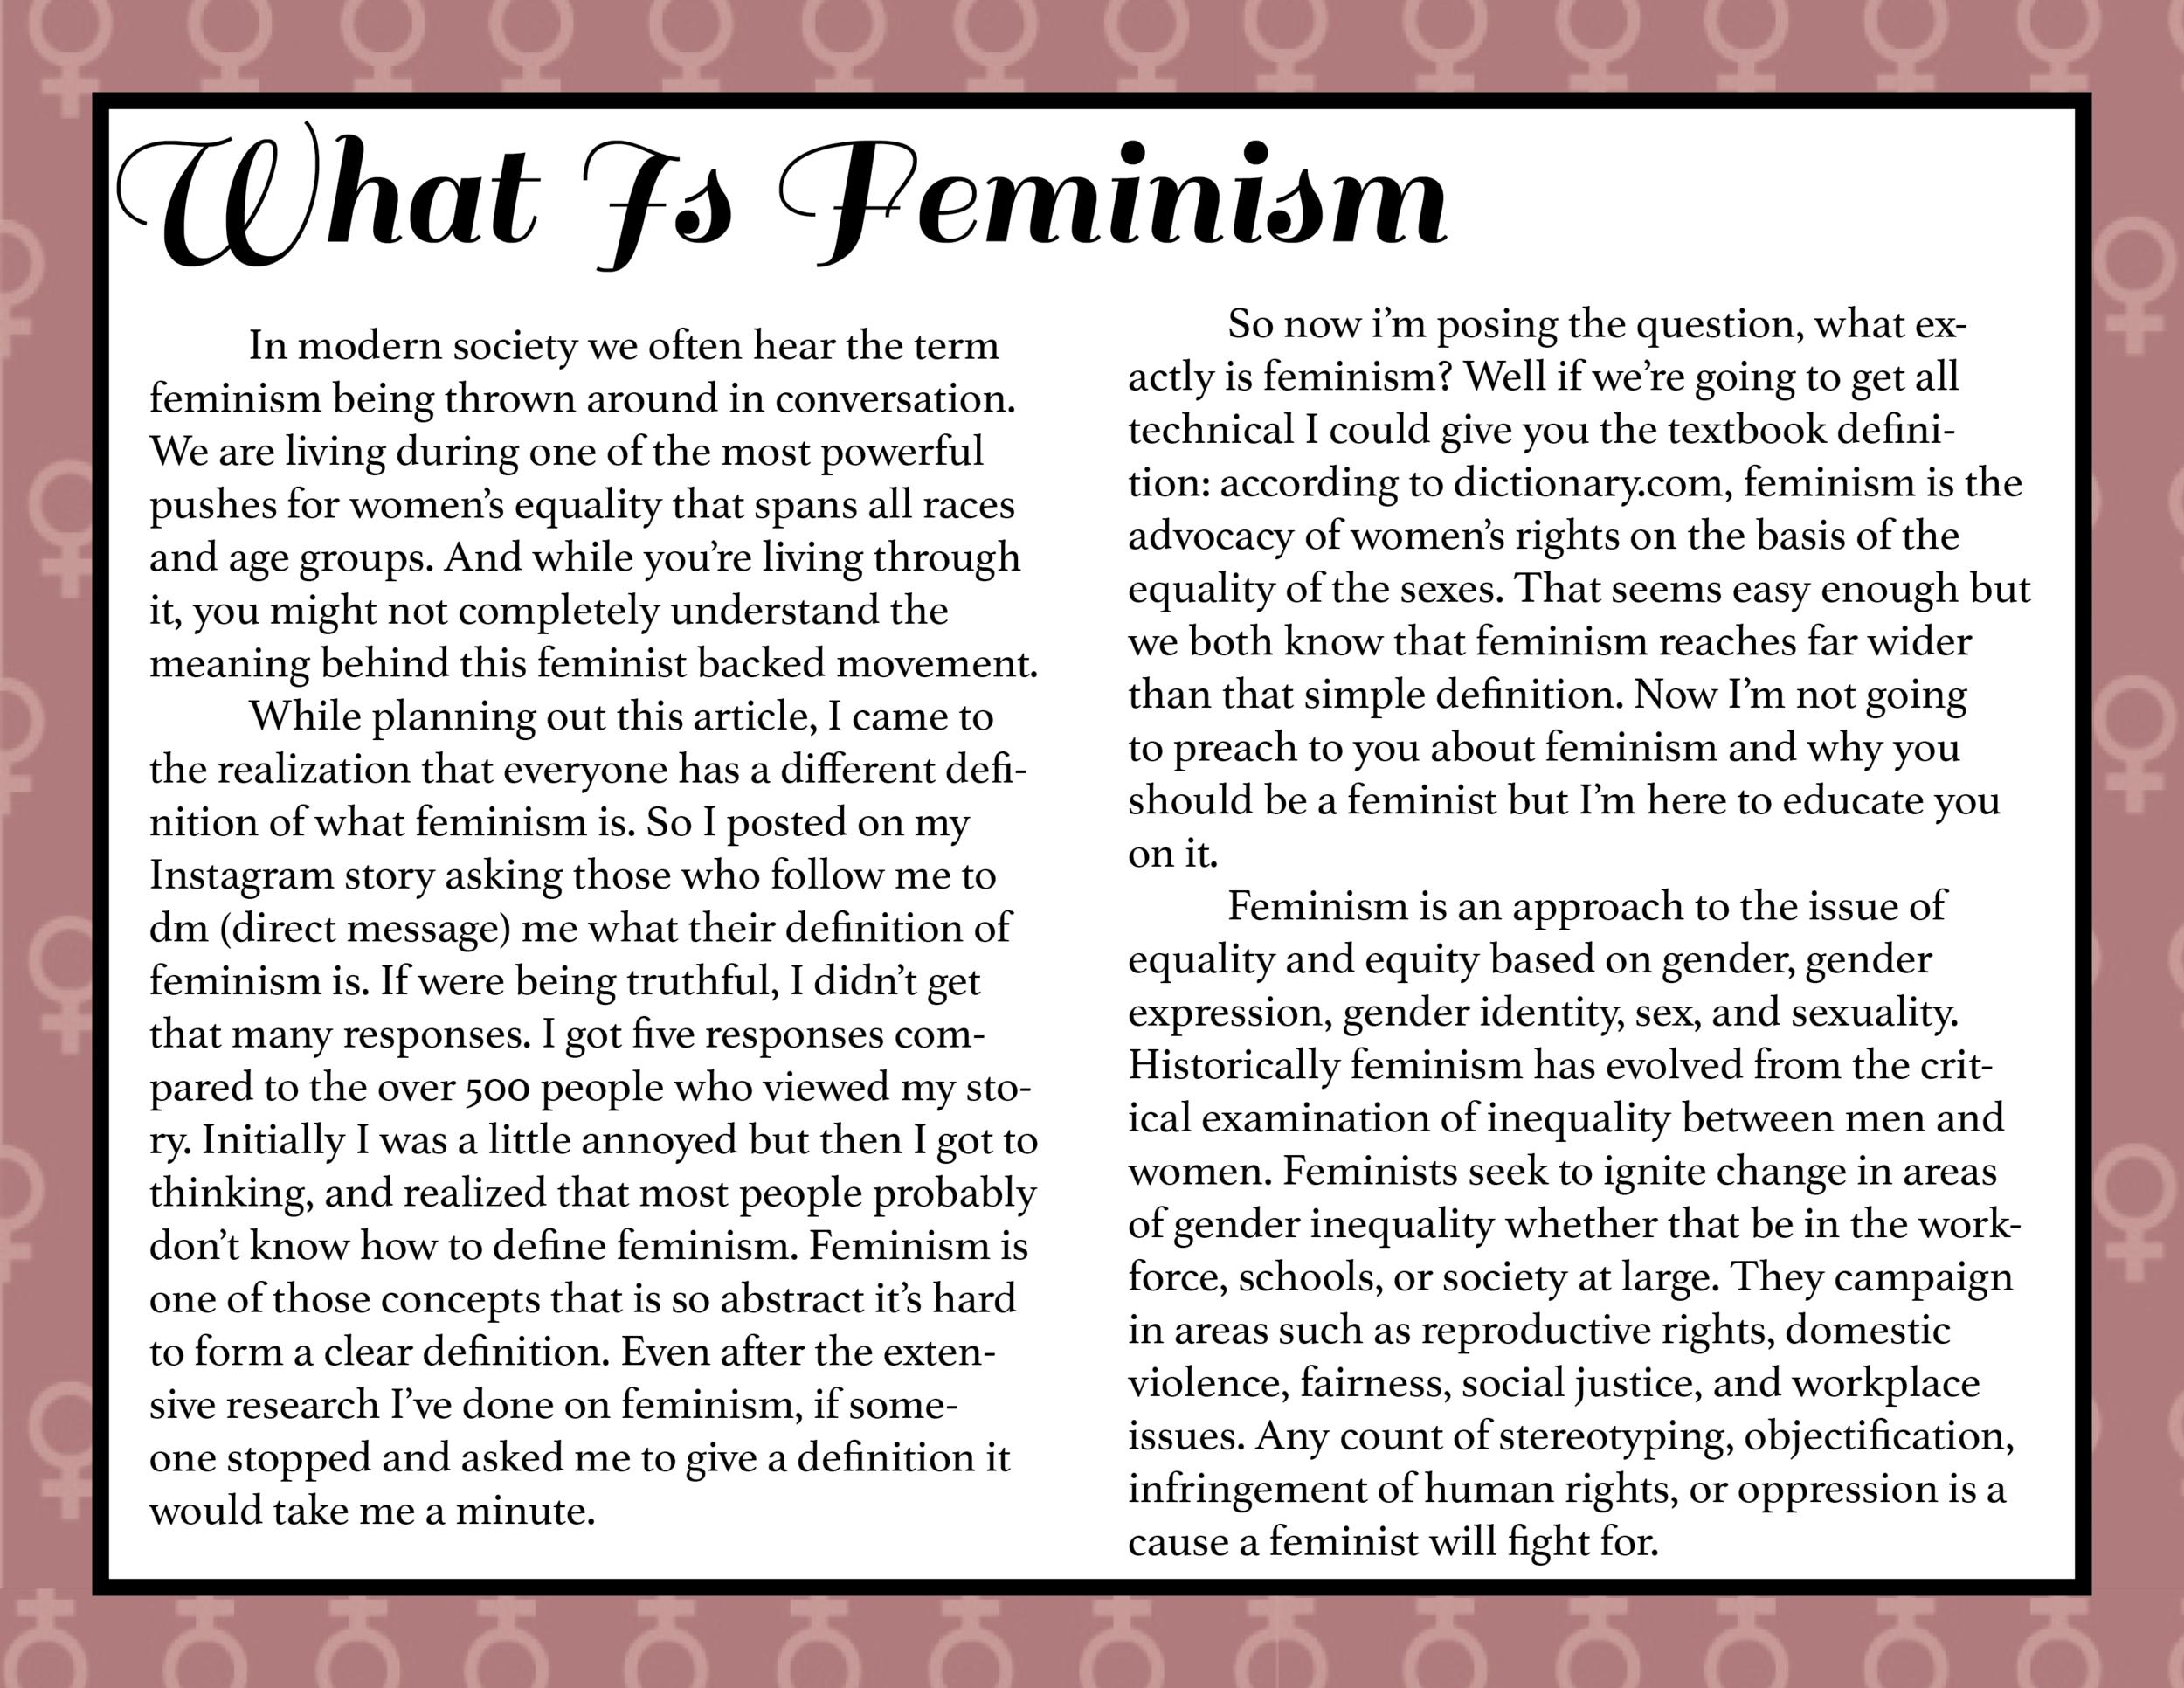 Feminism article2.png